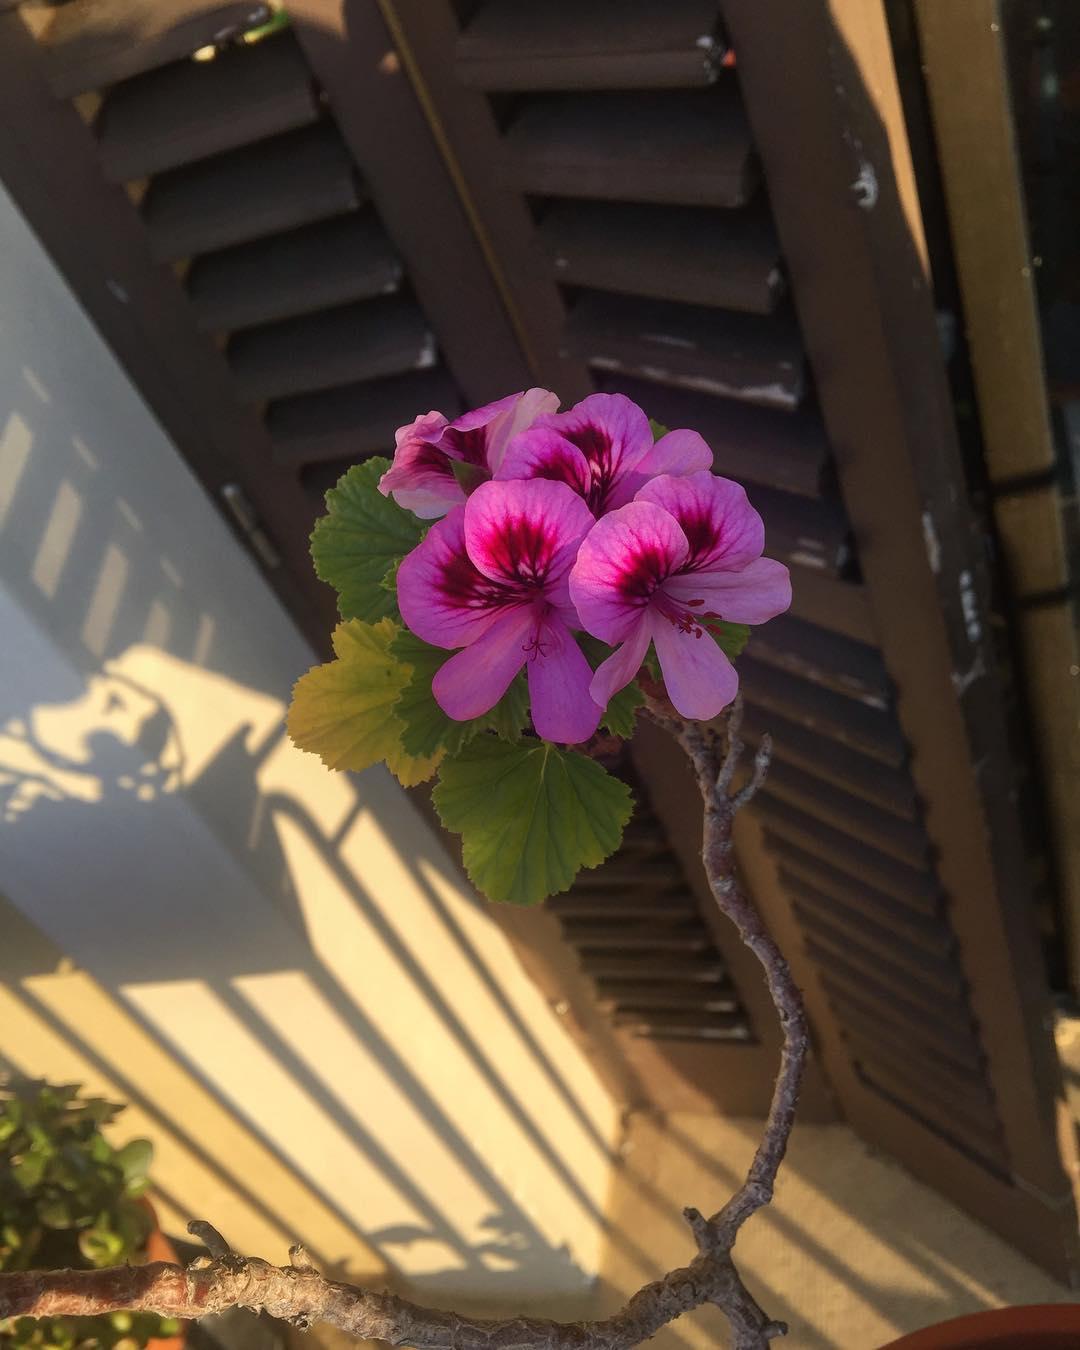 Mis flores regresan a saludar :))